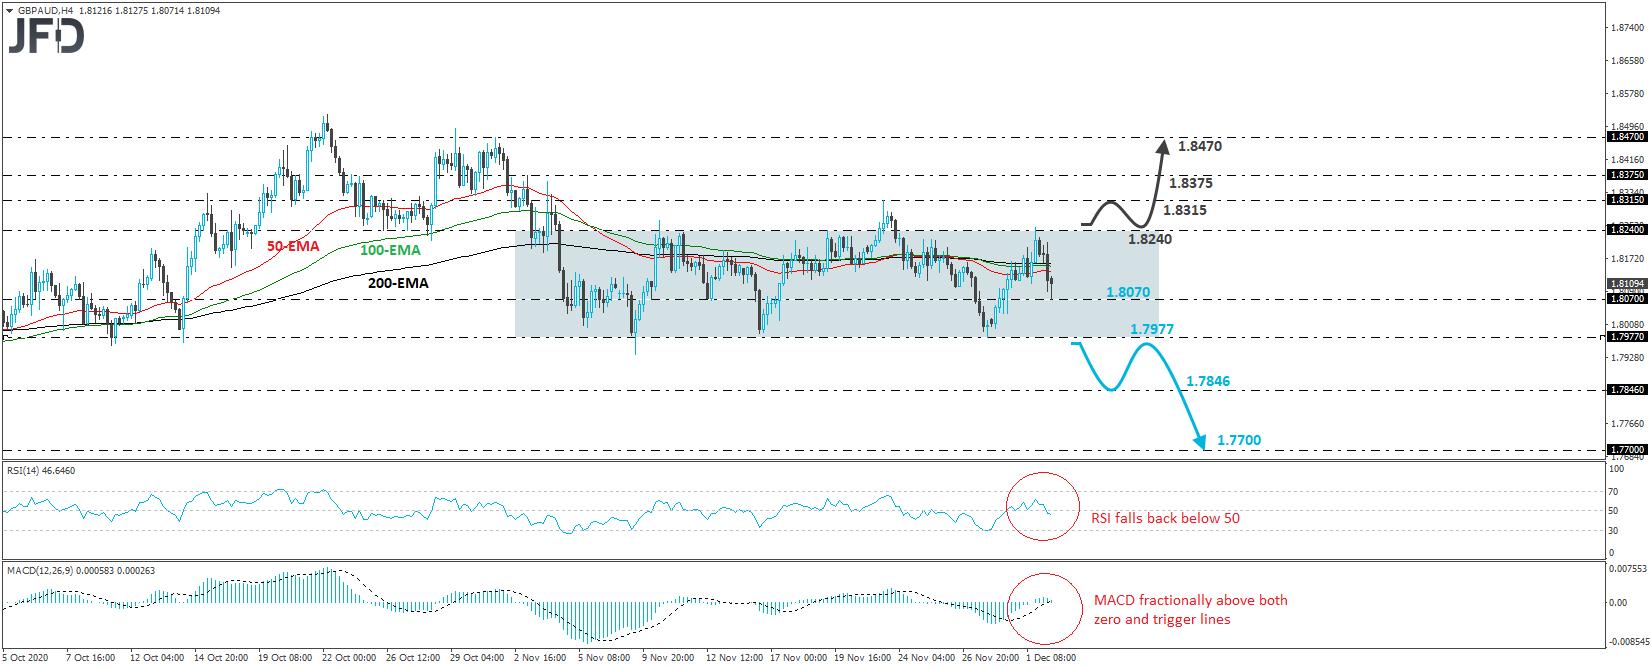 GBP/AUD 4-hour chart technical analysis